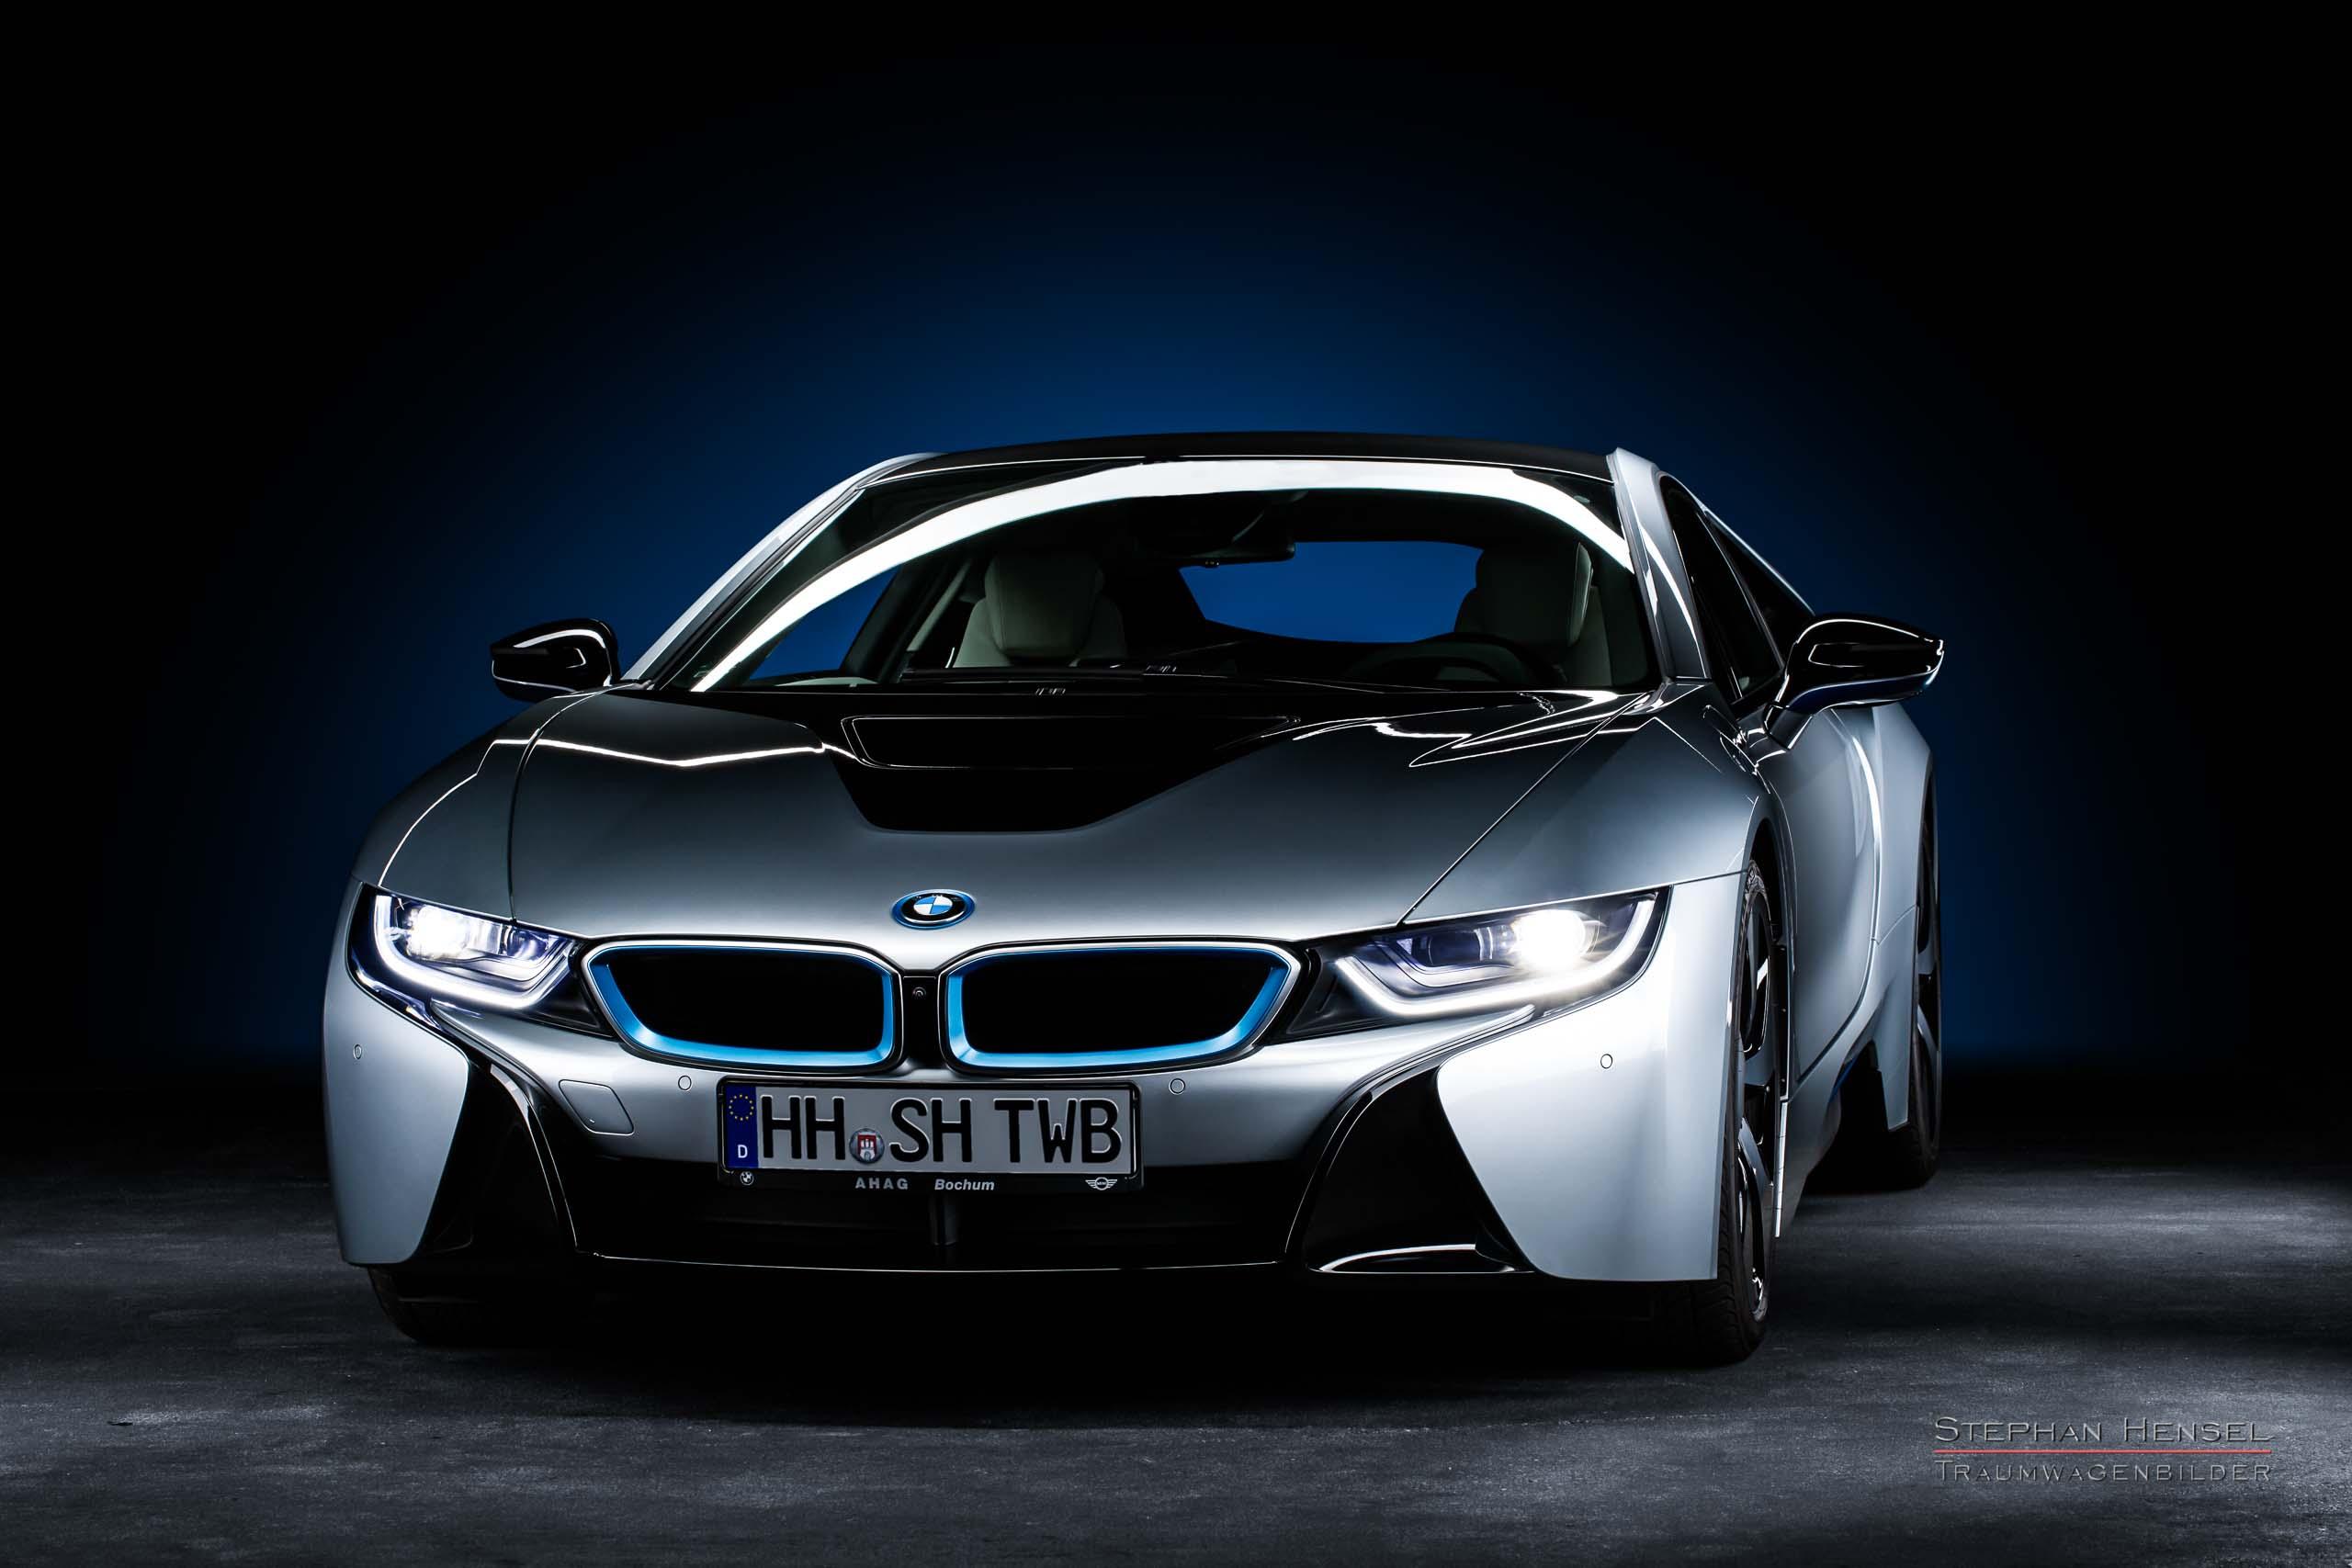 BMW i8, Ansicht von links vorn, Autofotograf: Stephan Hensel, Oldtimerfotograf, Hamburg